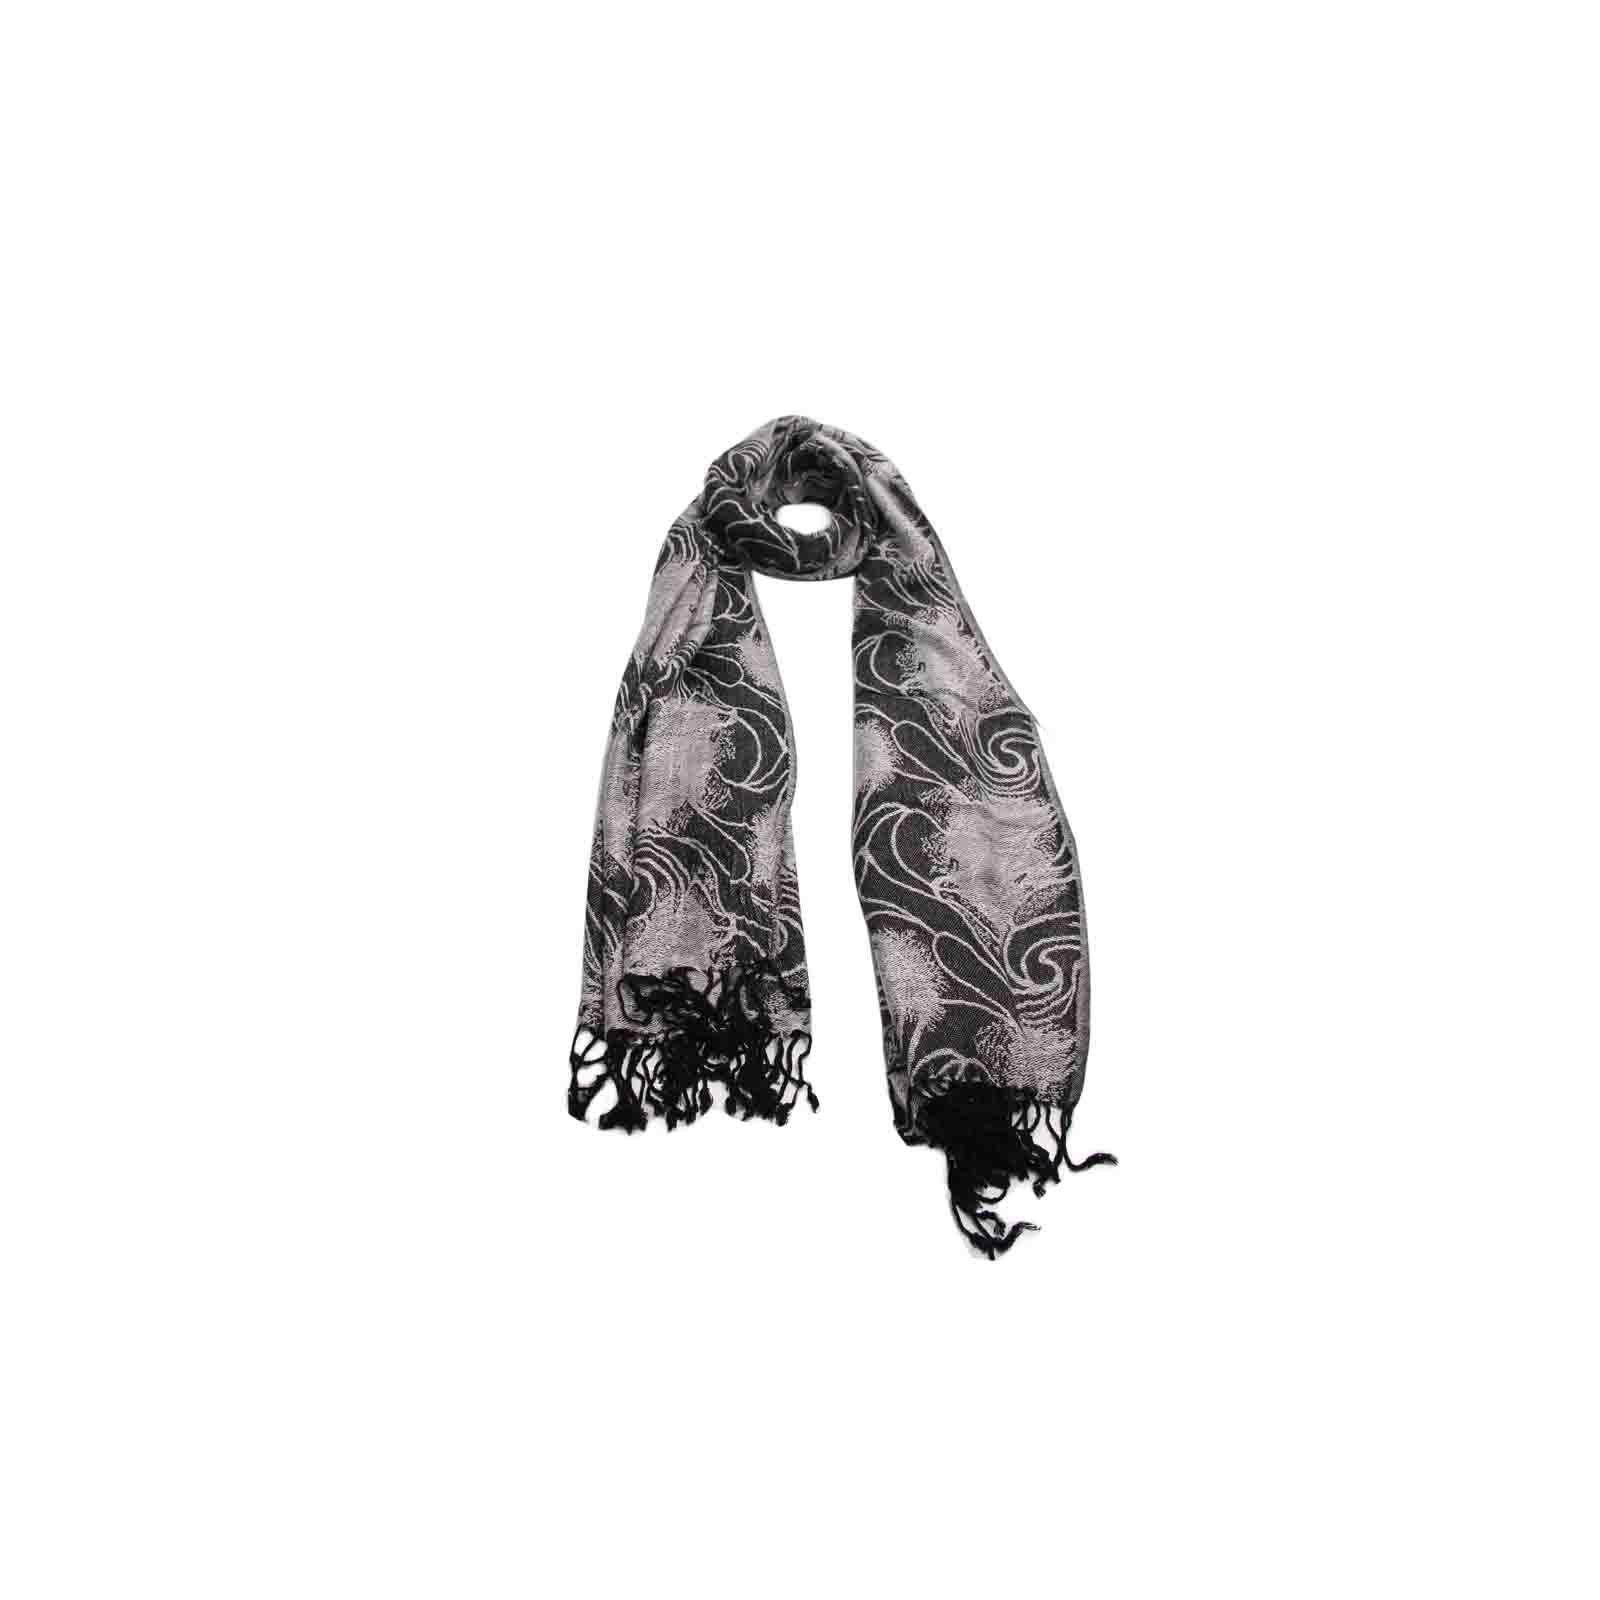 Pashmina Furacão Negro de Viscose #pashmina #pashimina #modafeminina #fashion #scarf #scarfs